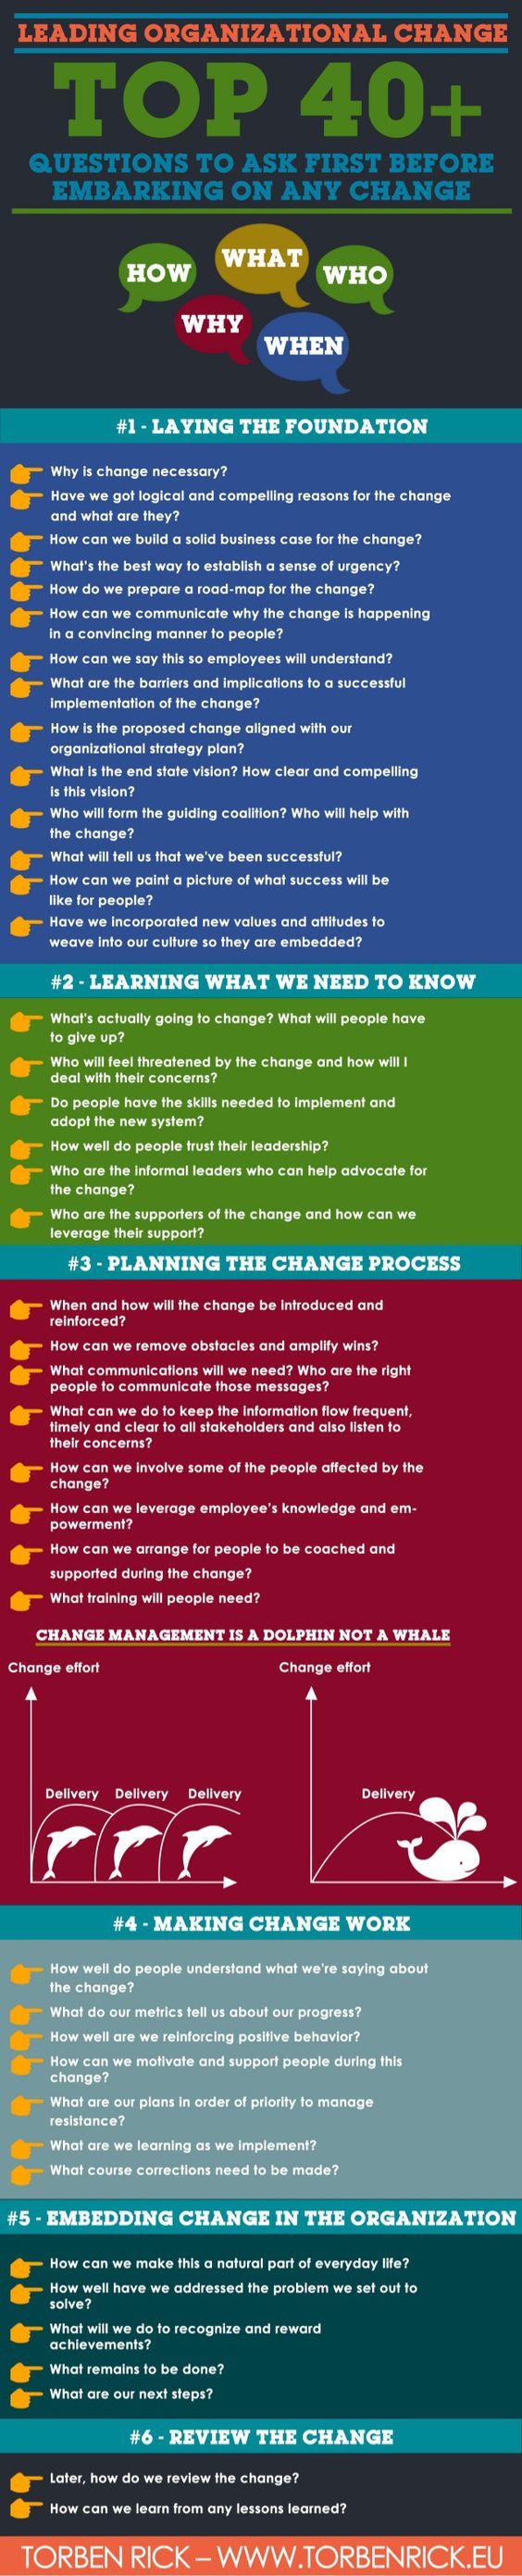 Leading organizational change #infografia #infographic